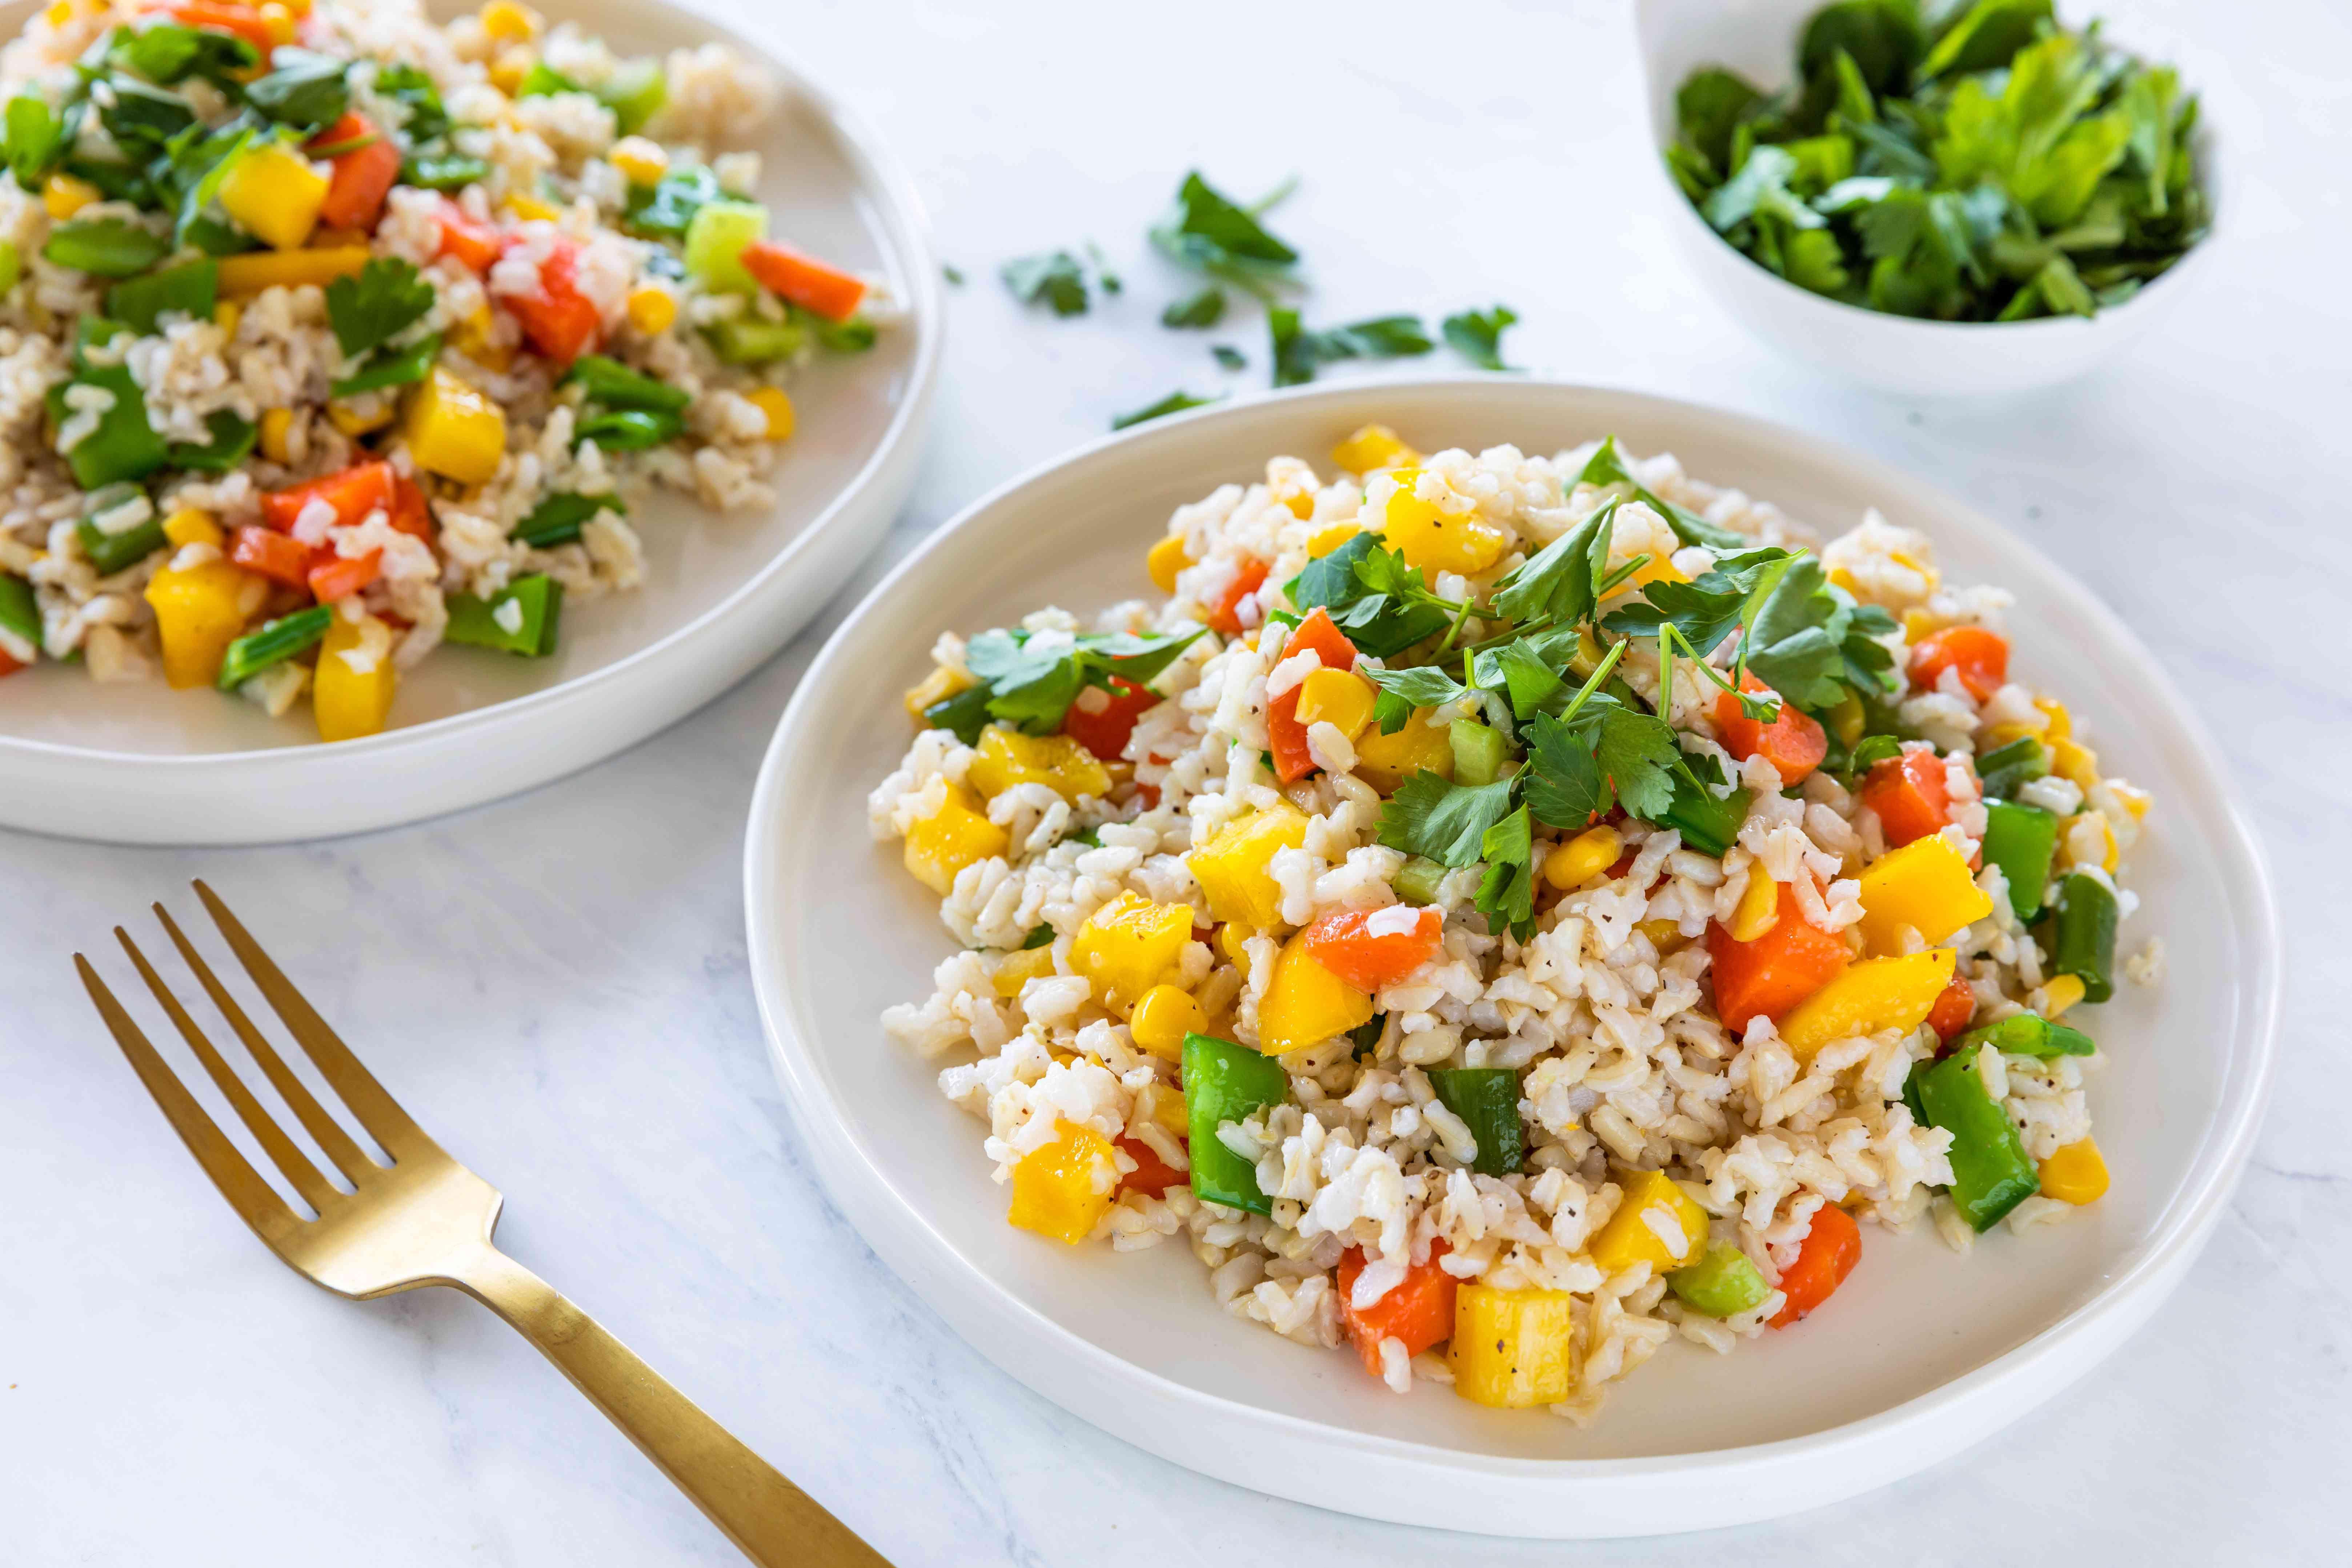 Cold asian rice salad